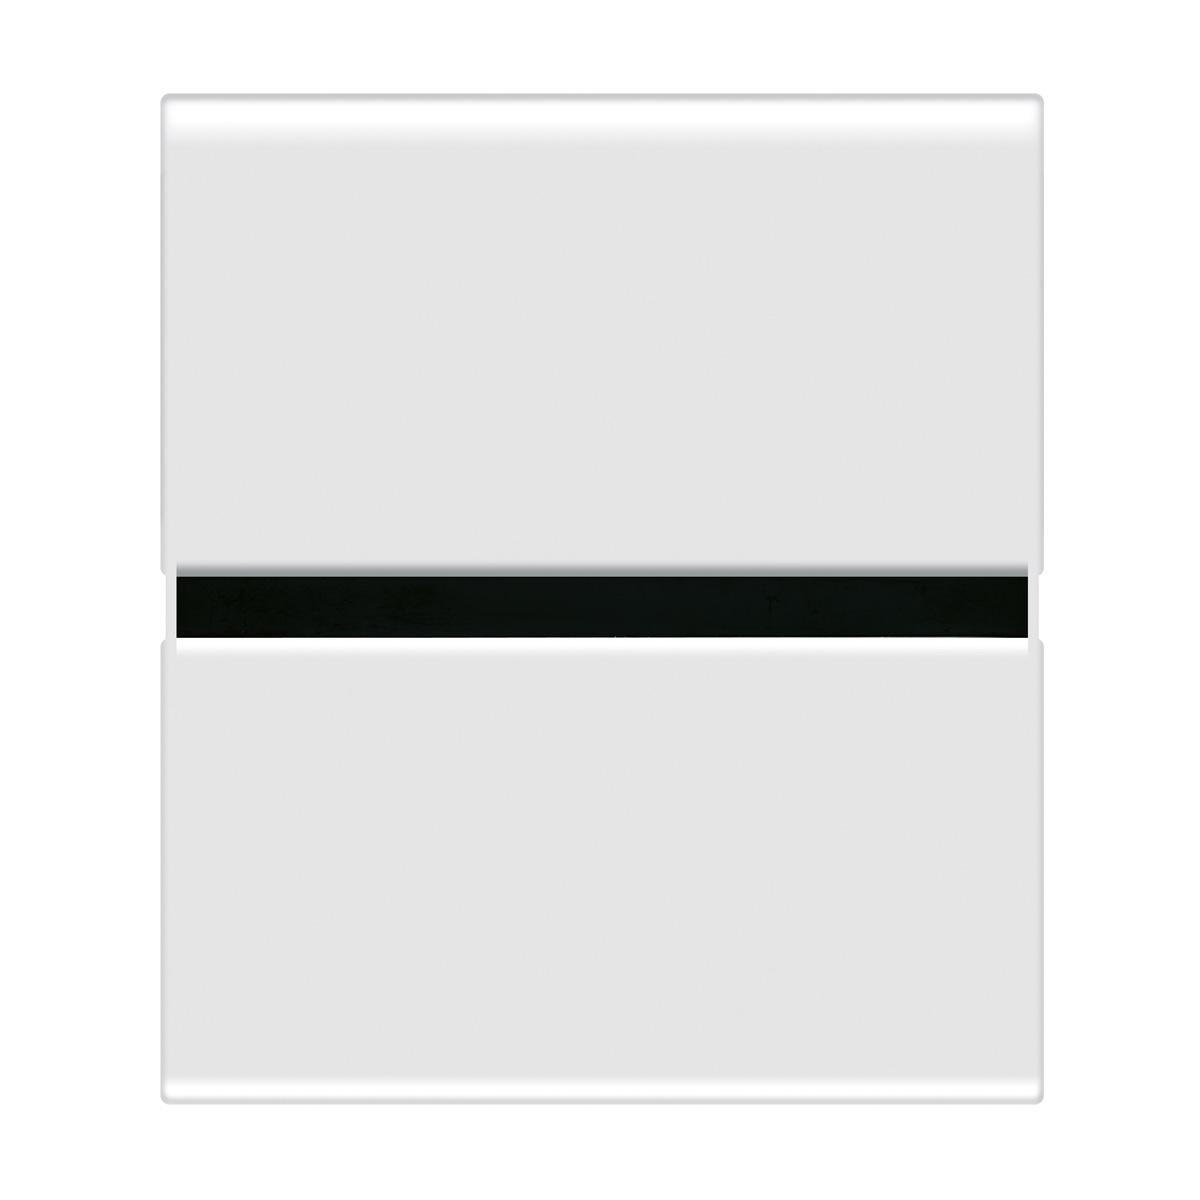 mepa urinal sp lautomatic sanicontrol 925 f r urinal element wei 718246 reuter onlineshop. Black Bedroom Furniture Sets. Home Design Ideas